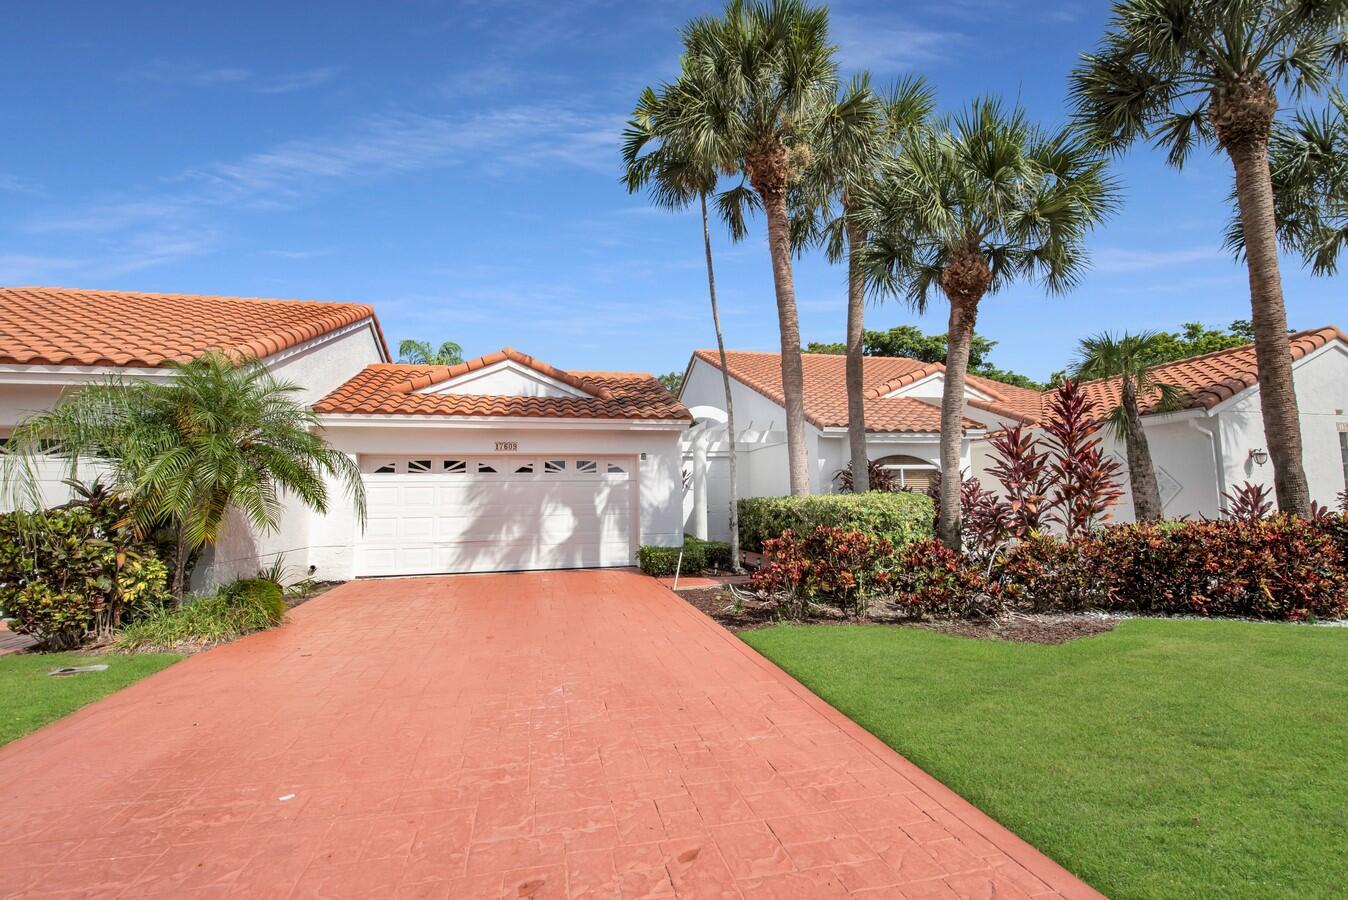 Photo of 17609 Candlewood Terrace, Boca Raton, FL 33487